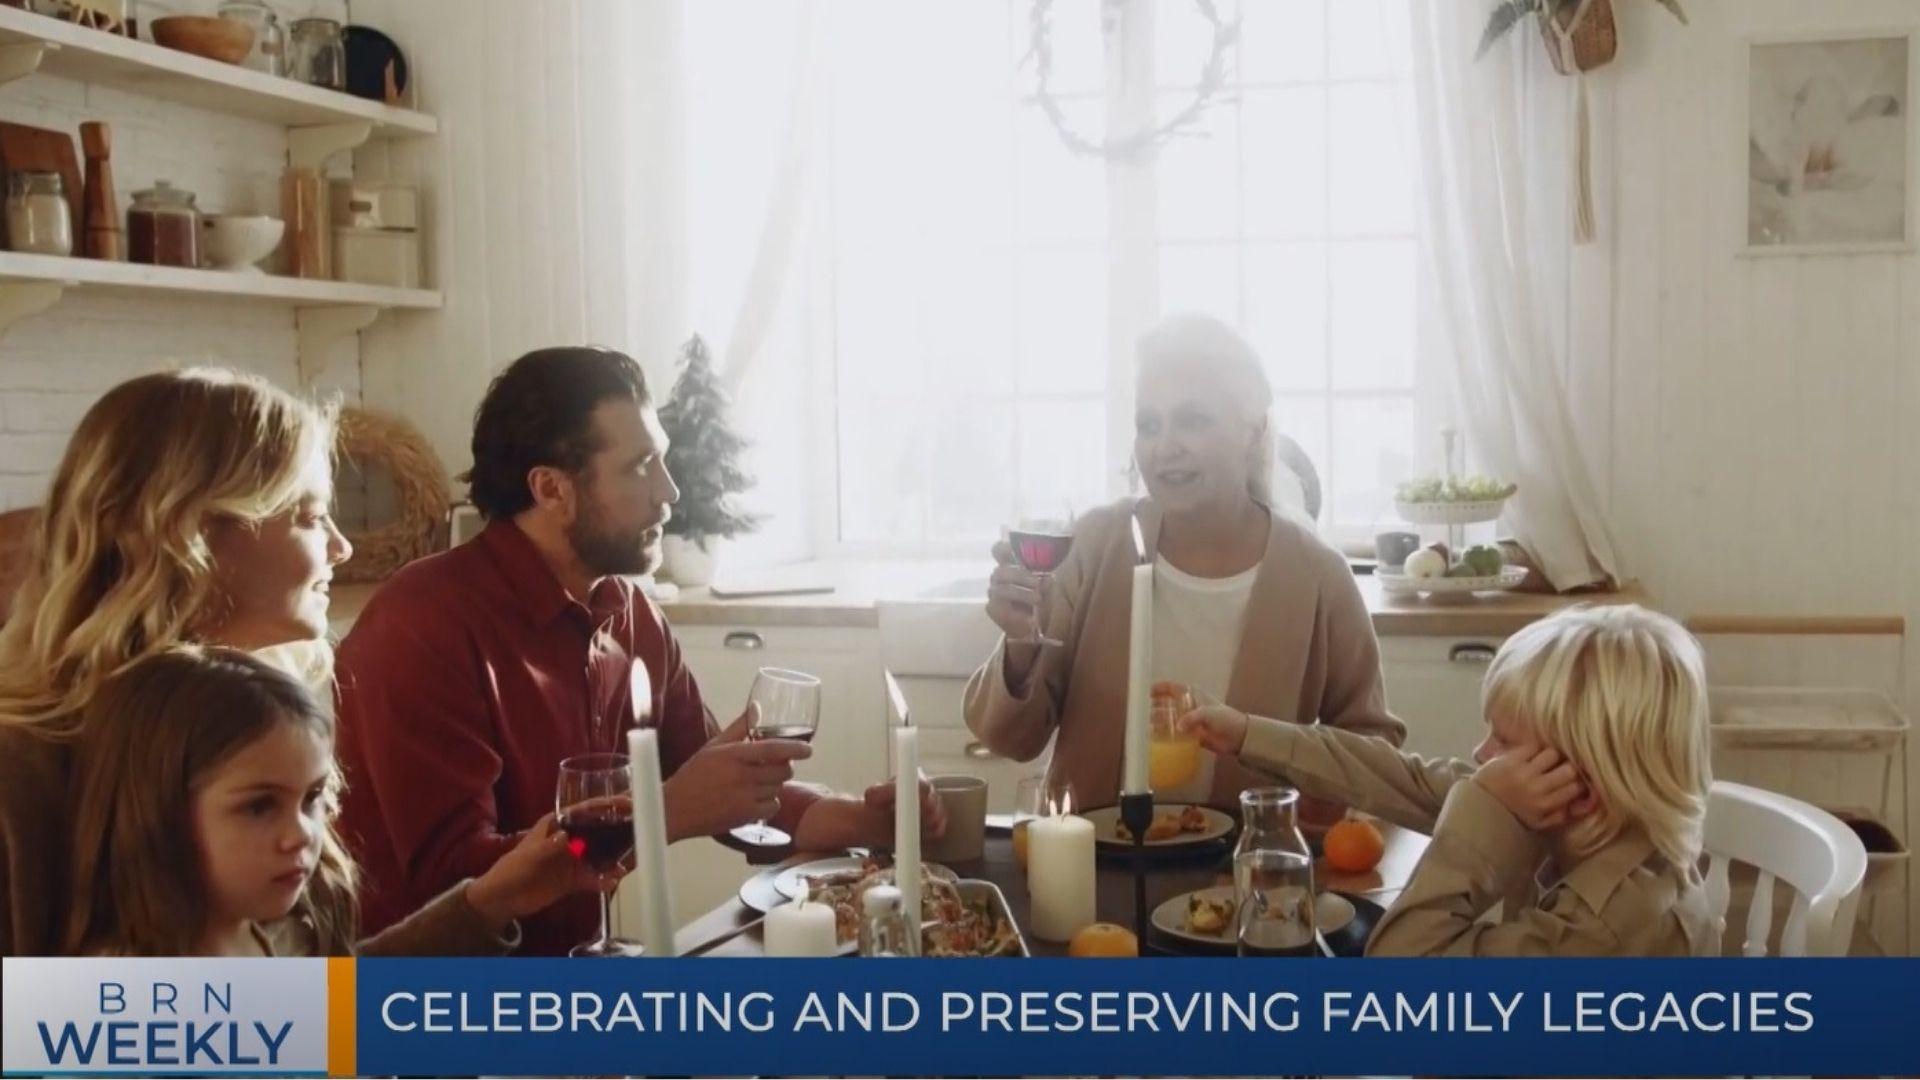 BRN Weekly | Celebrating and preserving family legacies